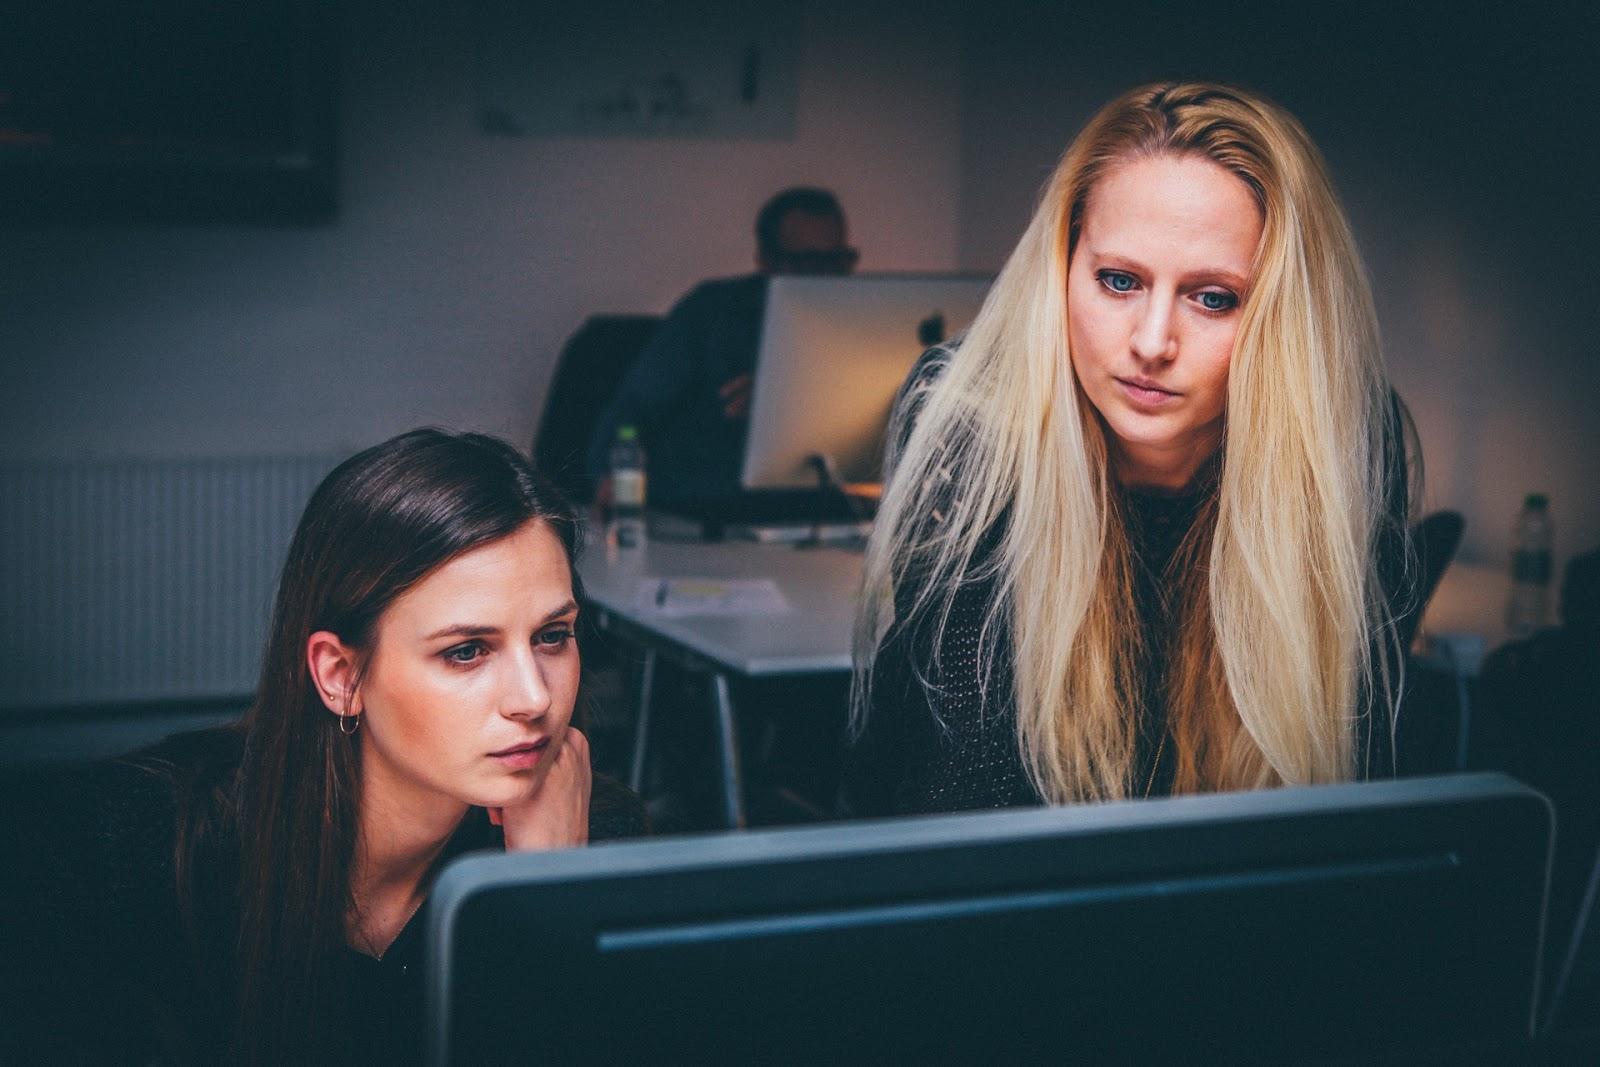 3 Reasons Cyber Security Needs Women